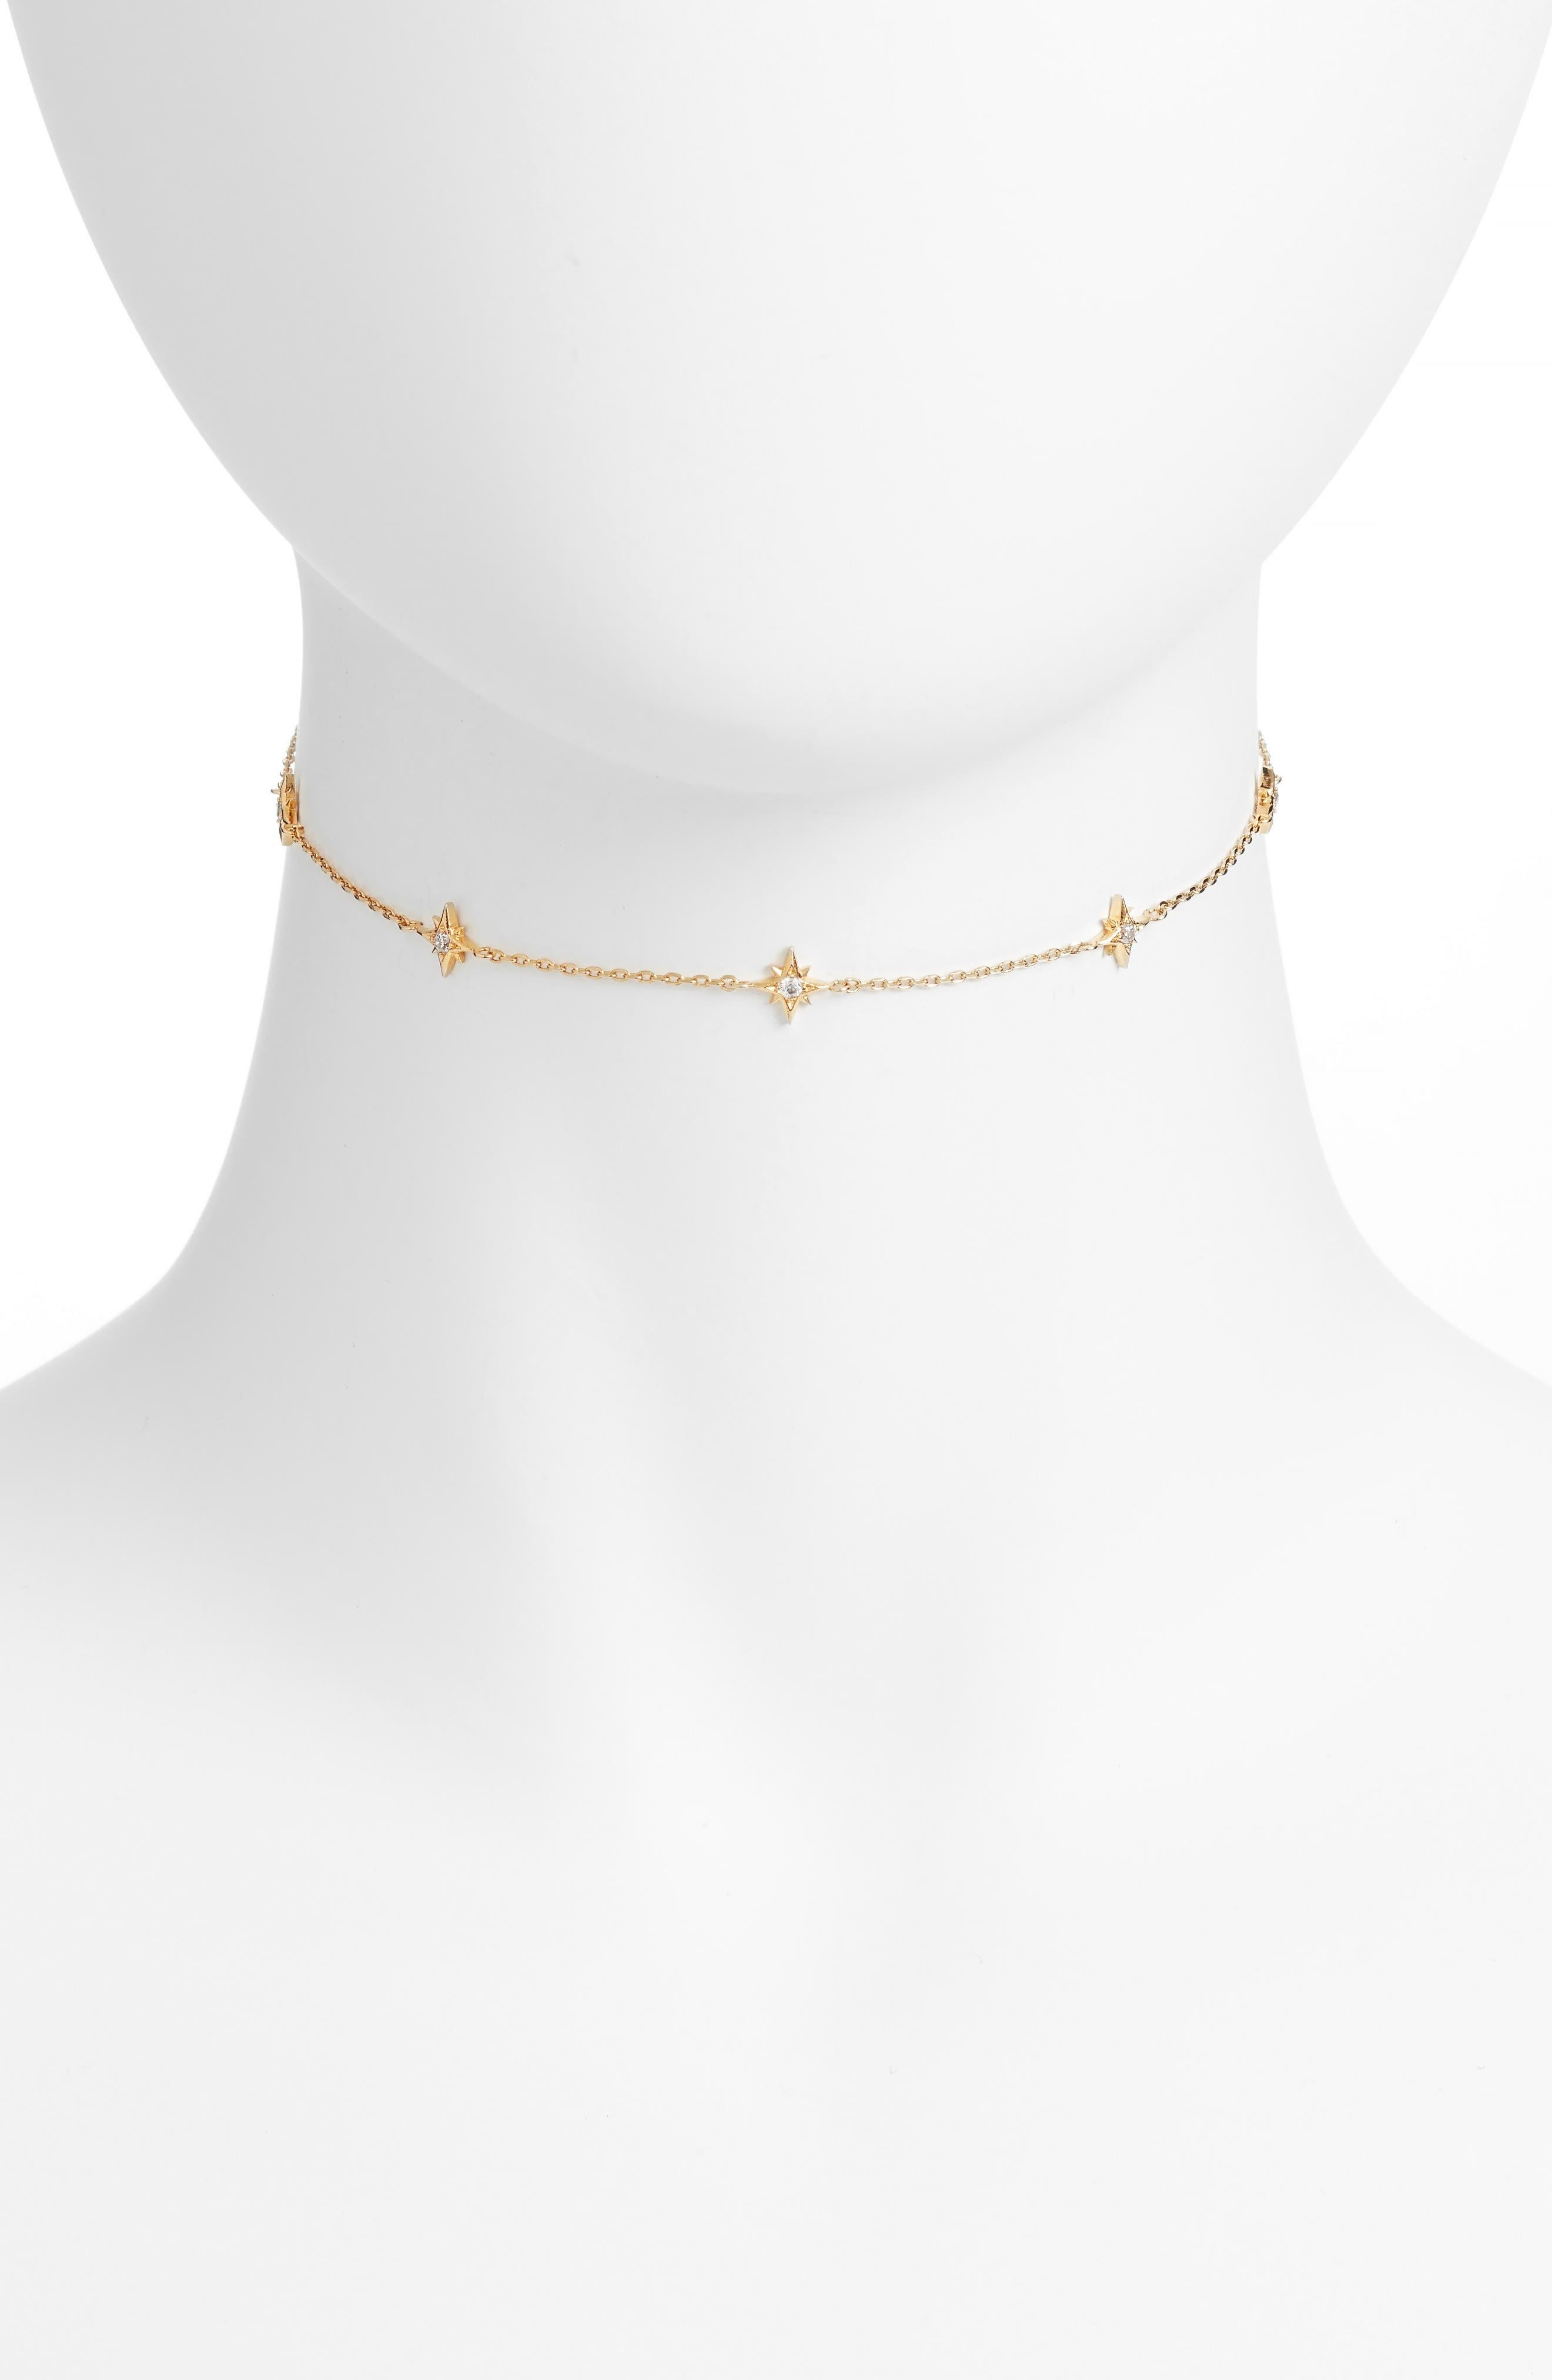 Mona Star Choker Necklace,                             Main thumbnail 1, color,                             710